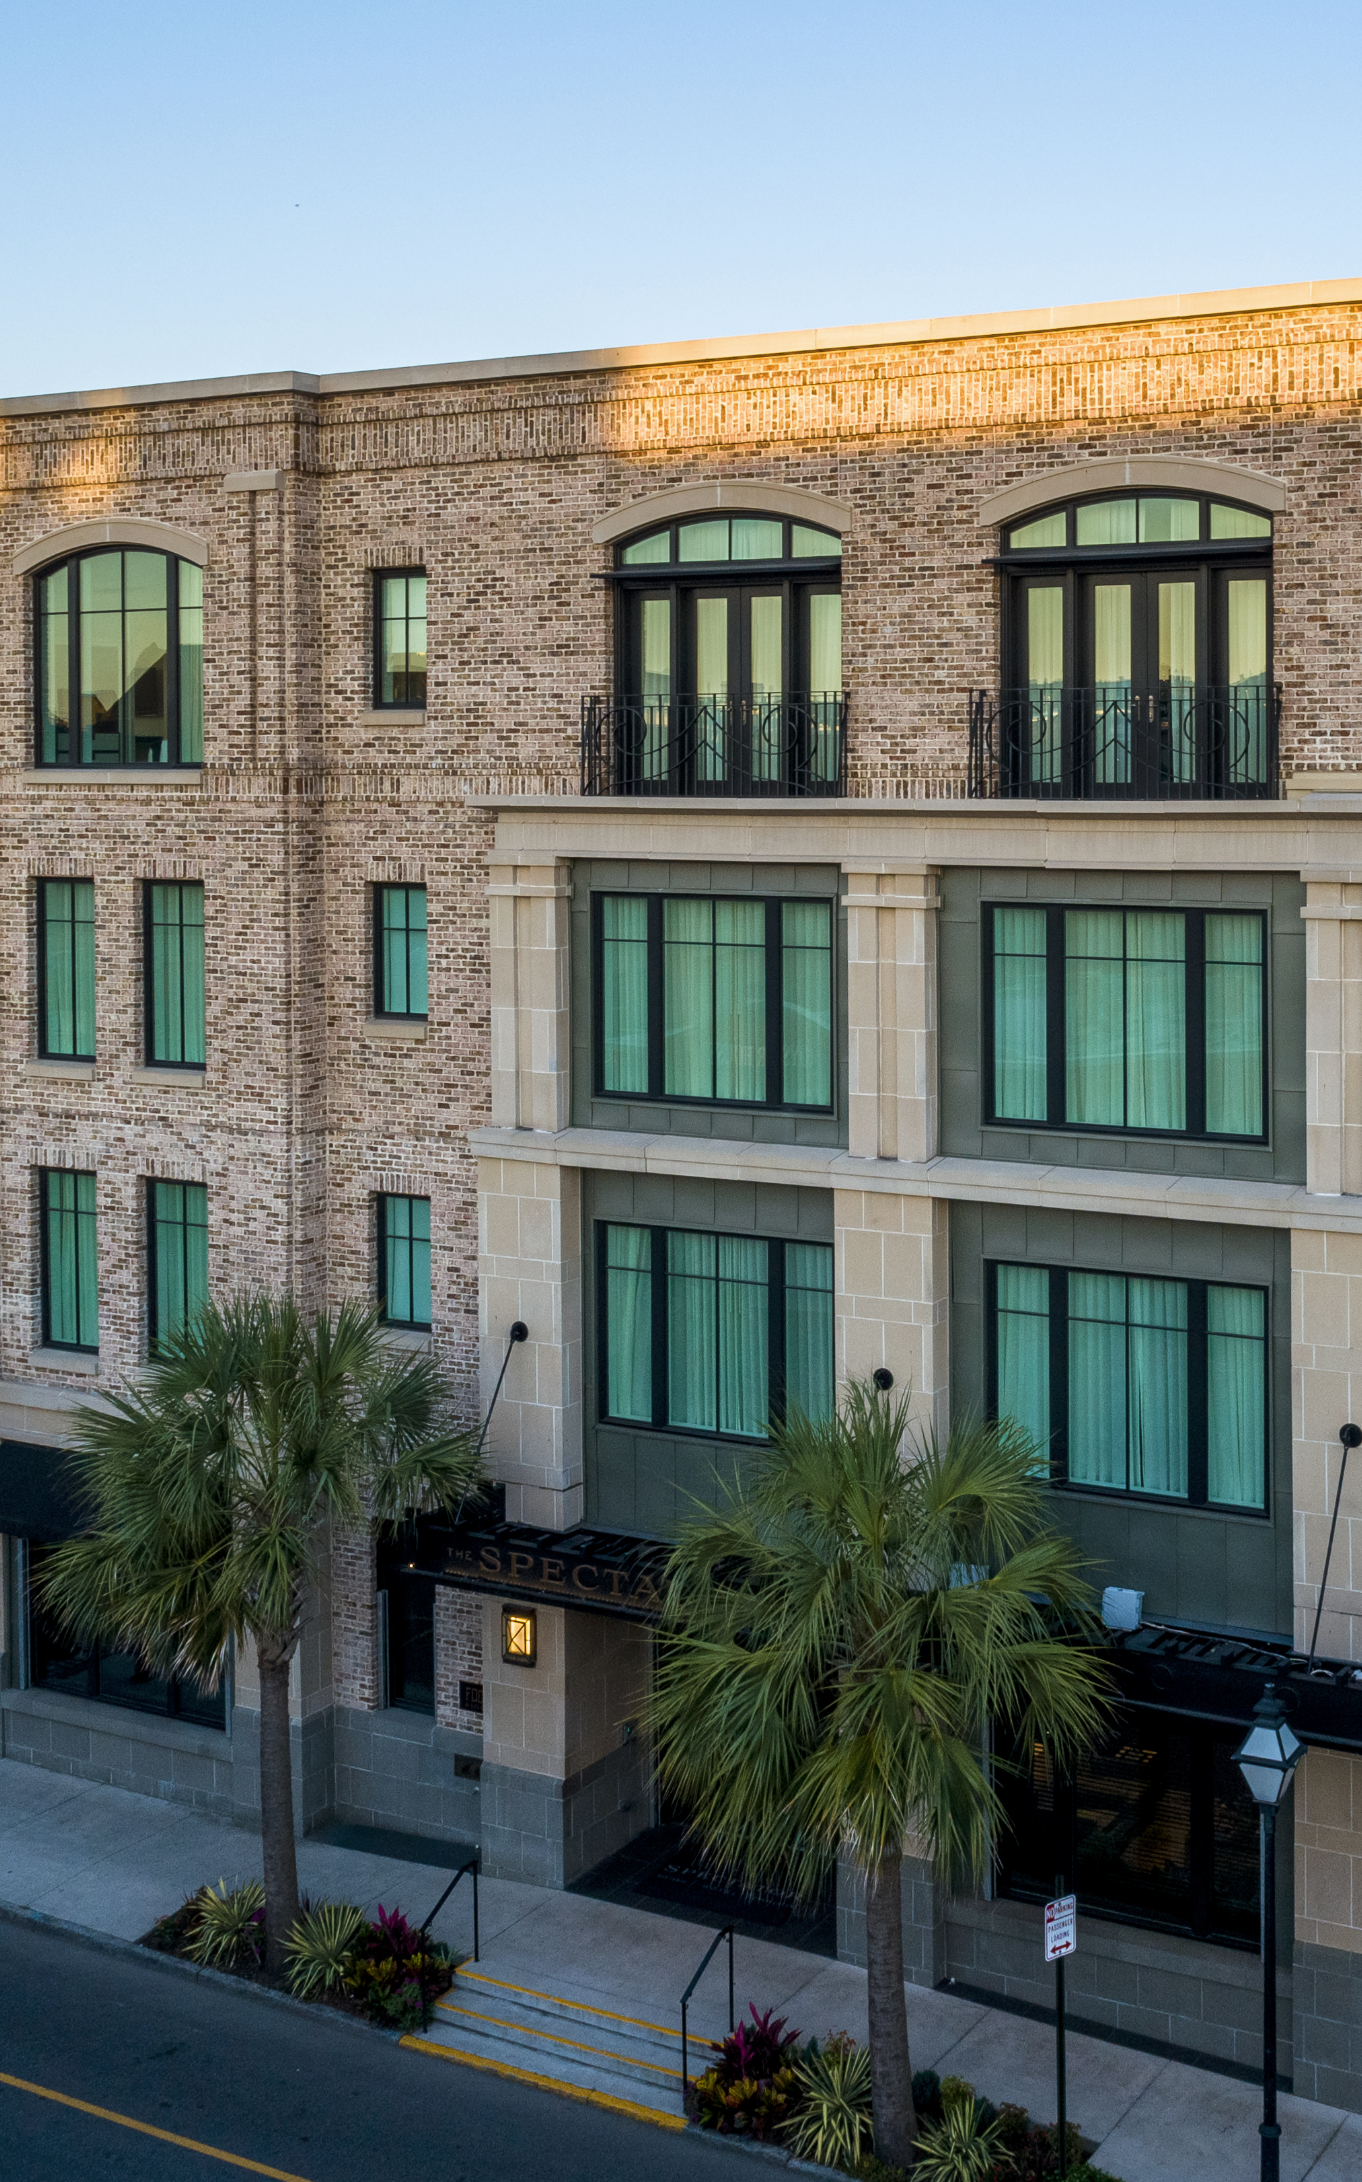 The spector brick hotel building